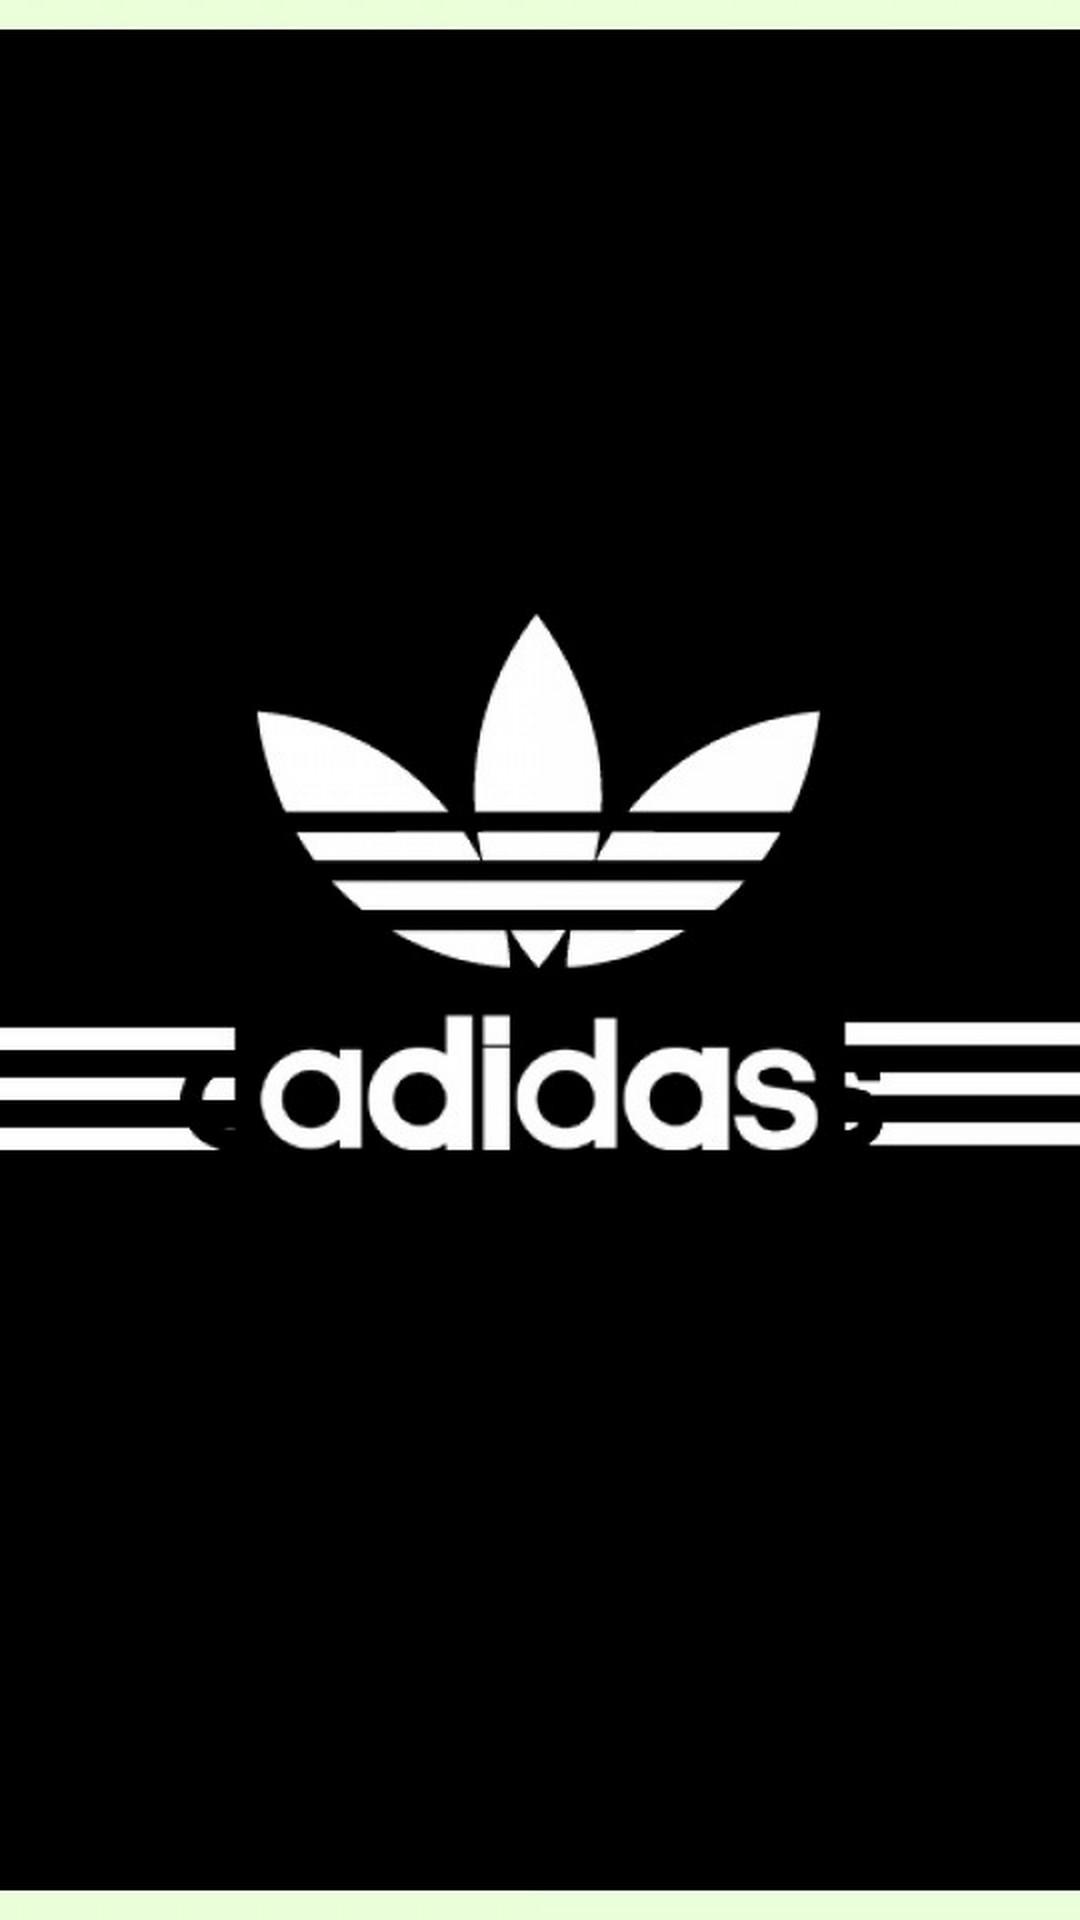 Adidas Iphone 7 Wallpaper Hd 2020 Phone Wallpaper Hd